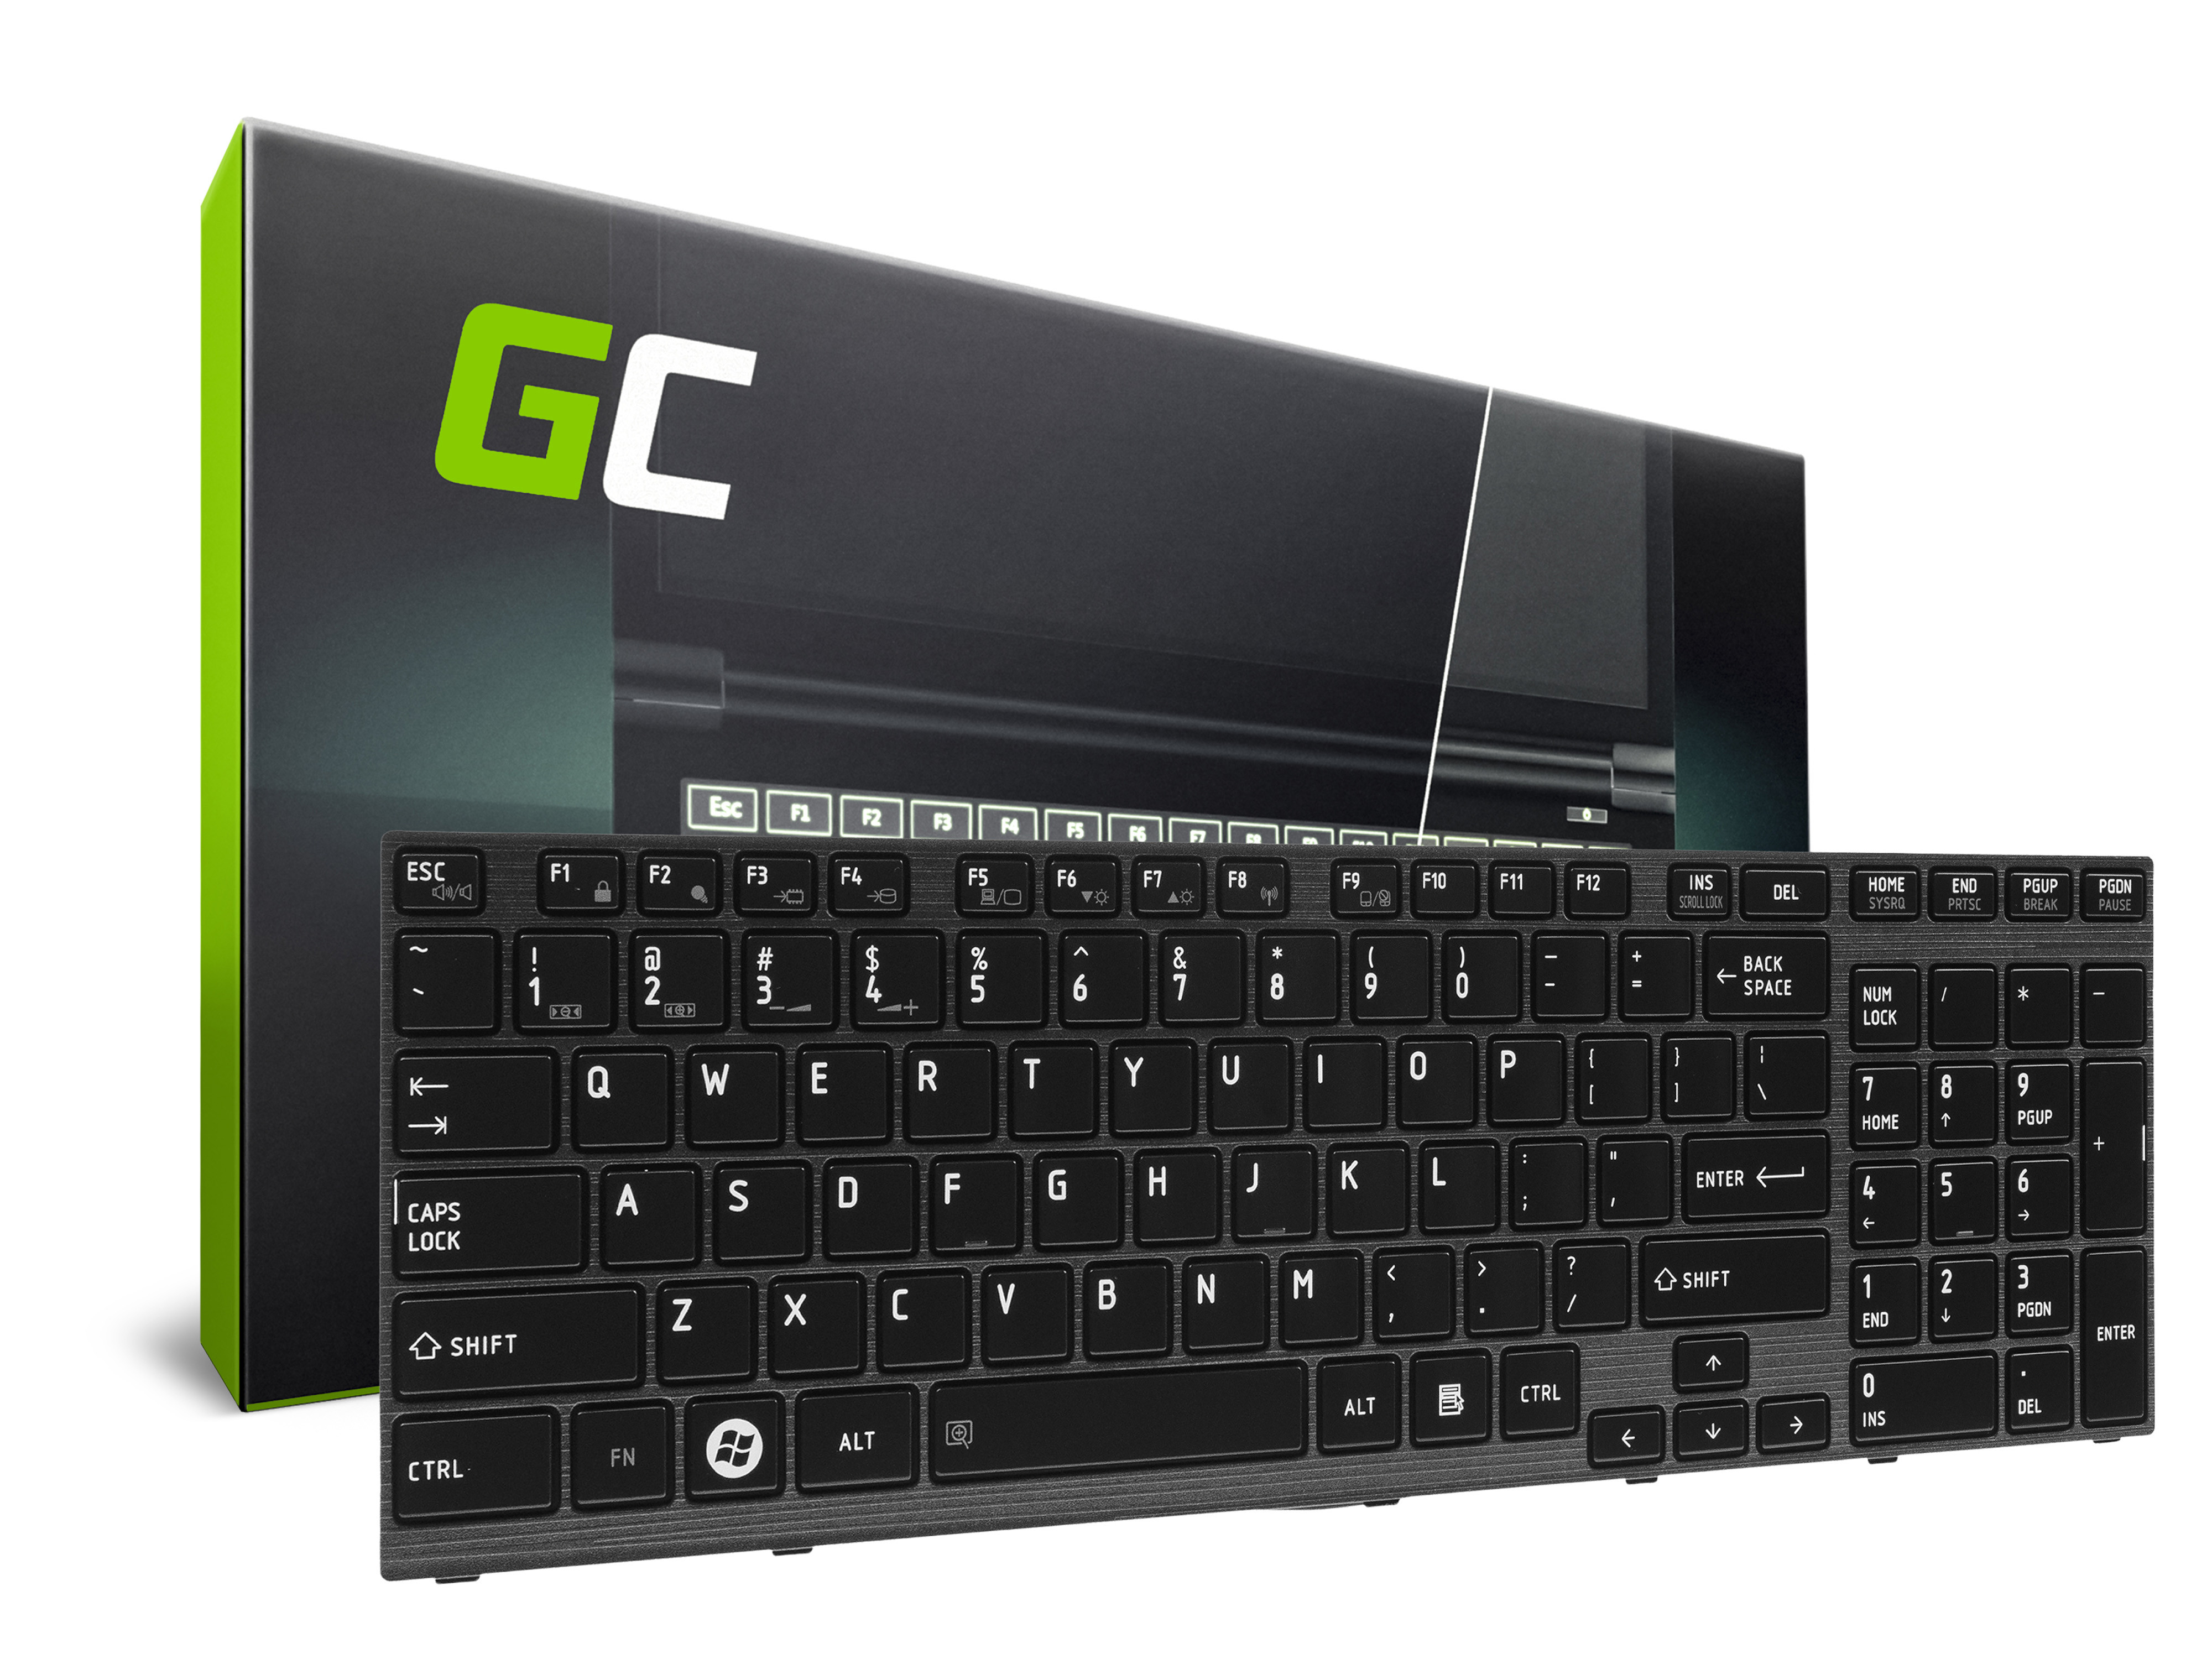 Green Cell Klávesnice pro notebook Toshiba Satellite P750 P750D P755 P755D P770 P770D P775 P775D